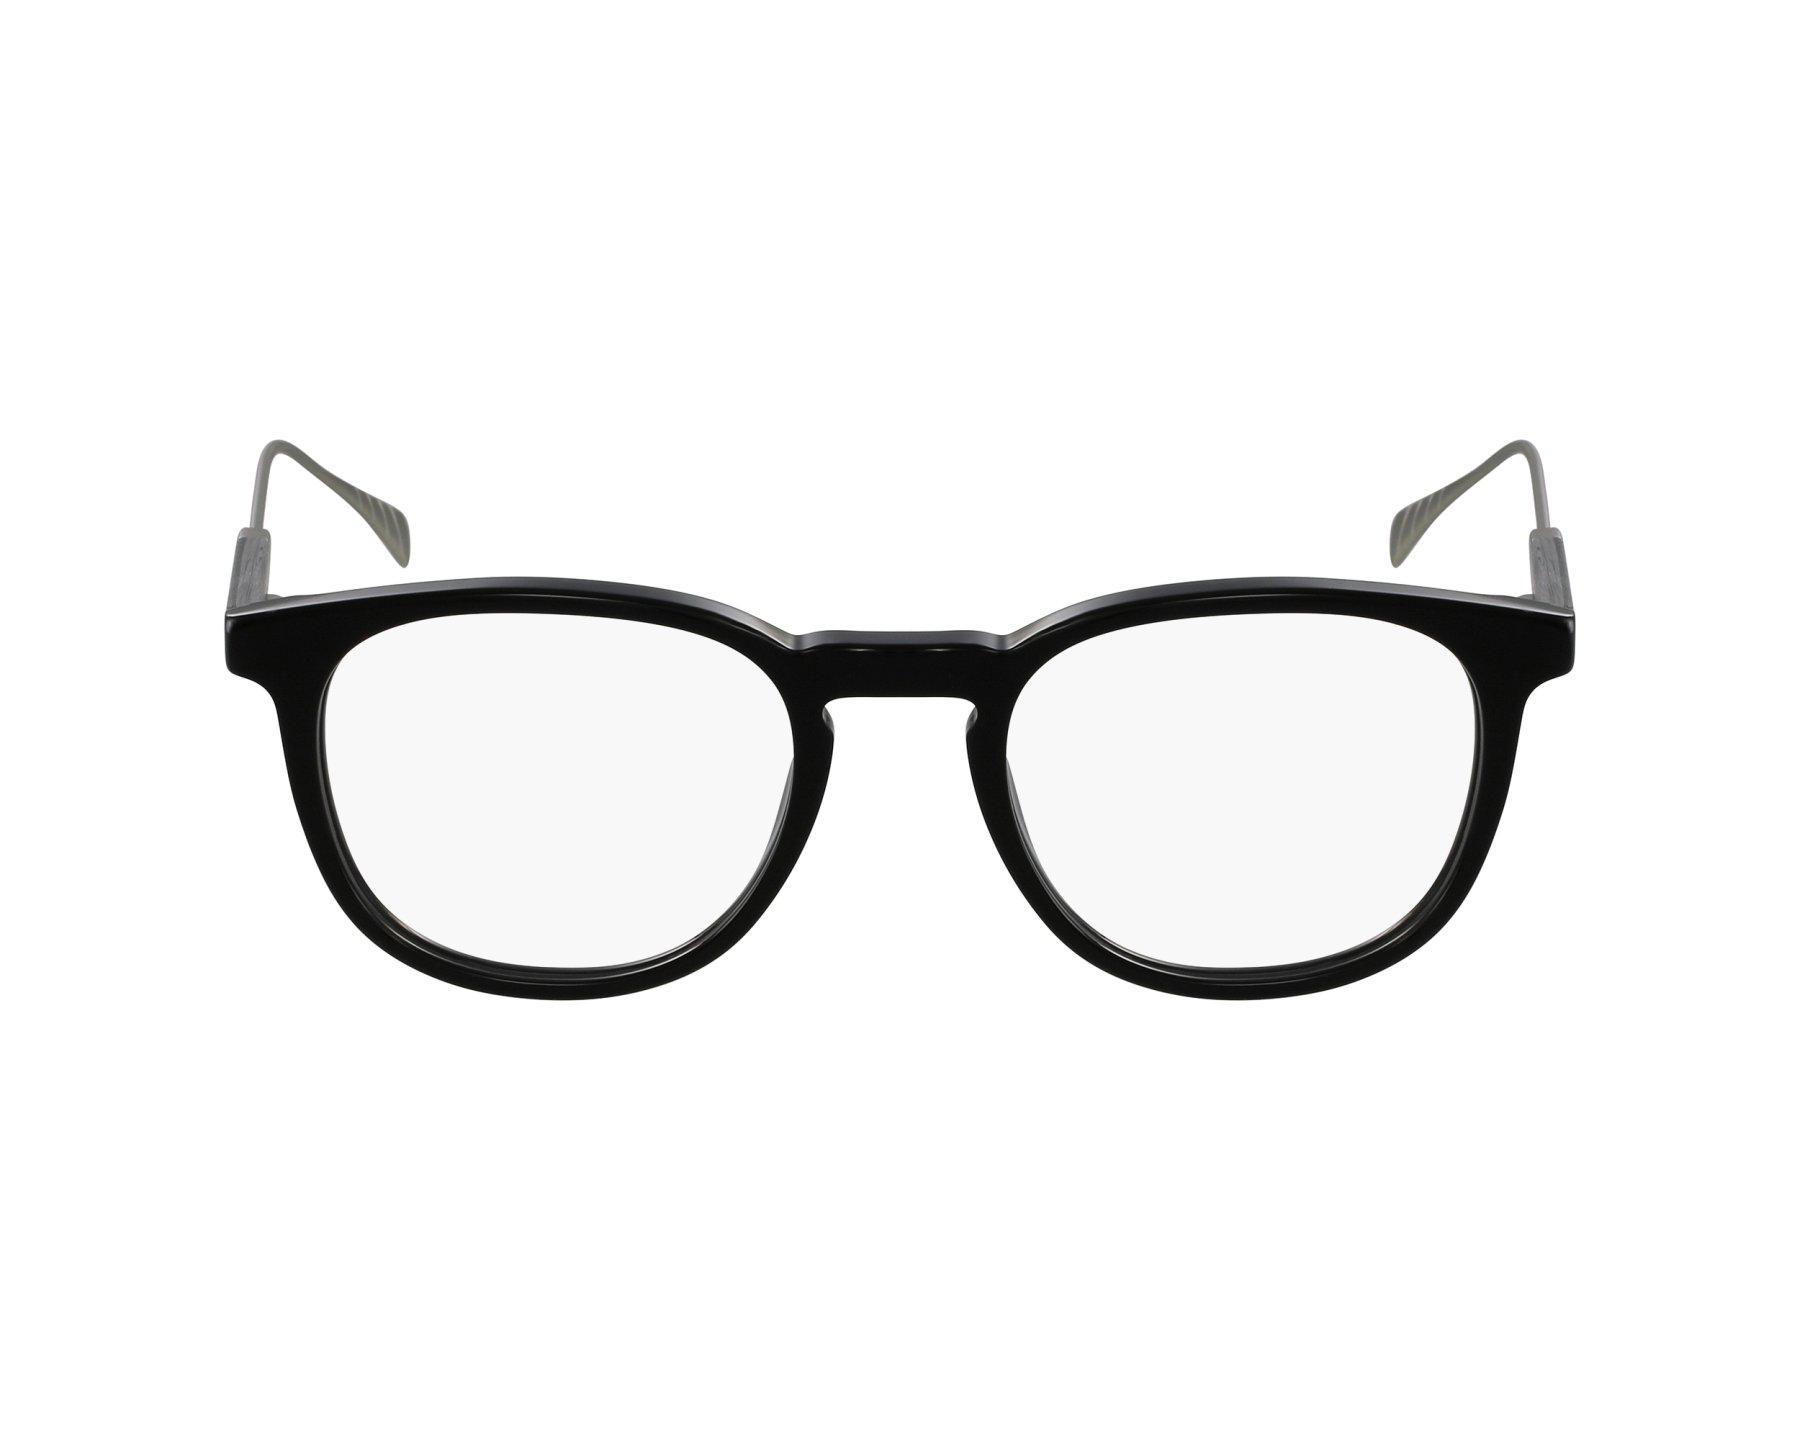 NEW Authentic Tommy Hilfiger EyeGlasses frames TH 1384 SF9 | eBay